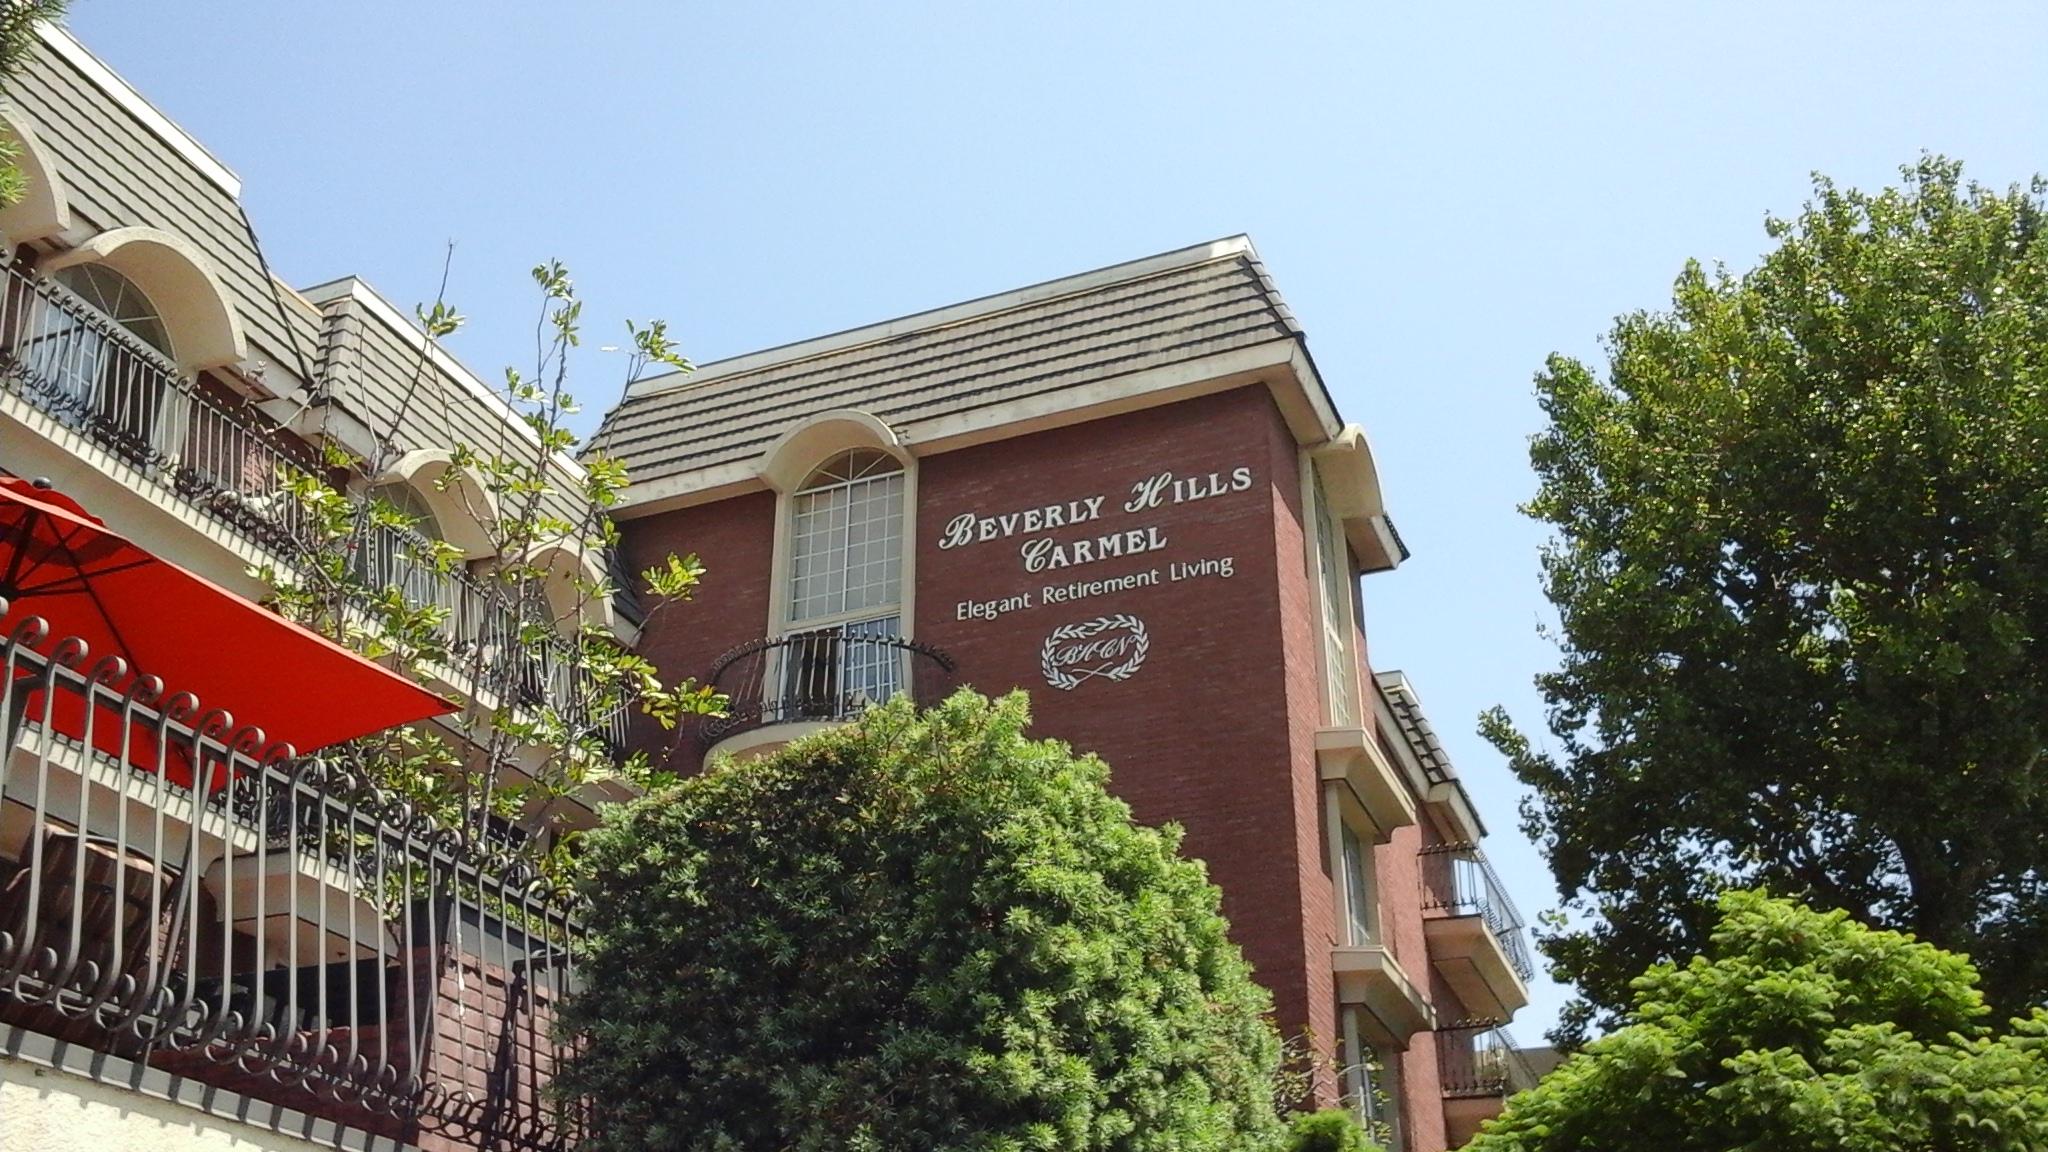 Beverly Hills Carmel